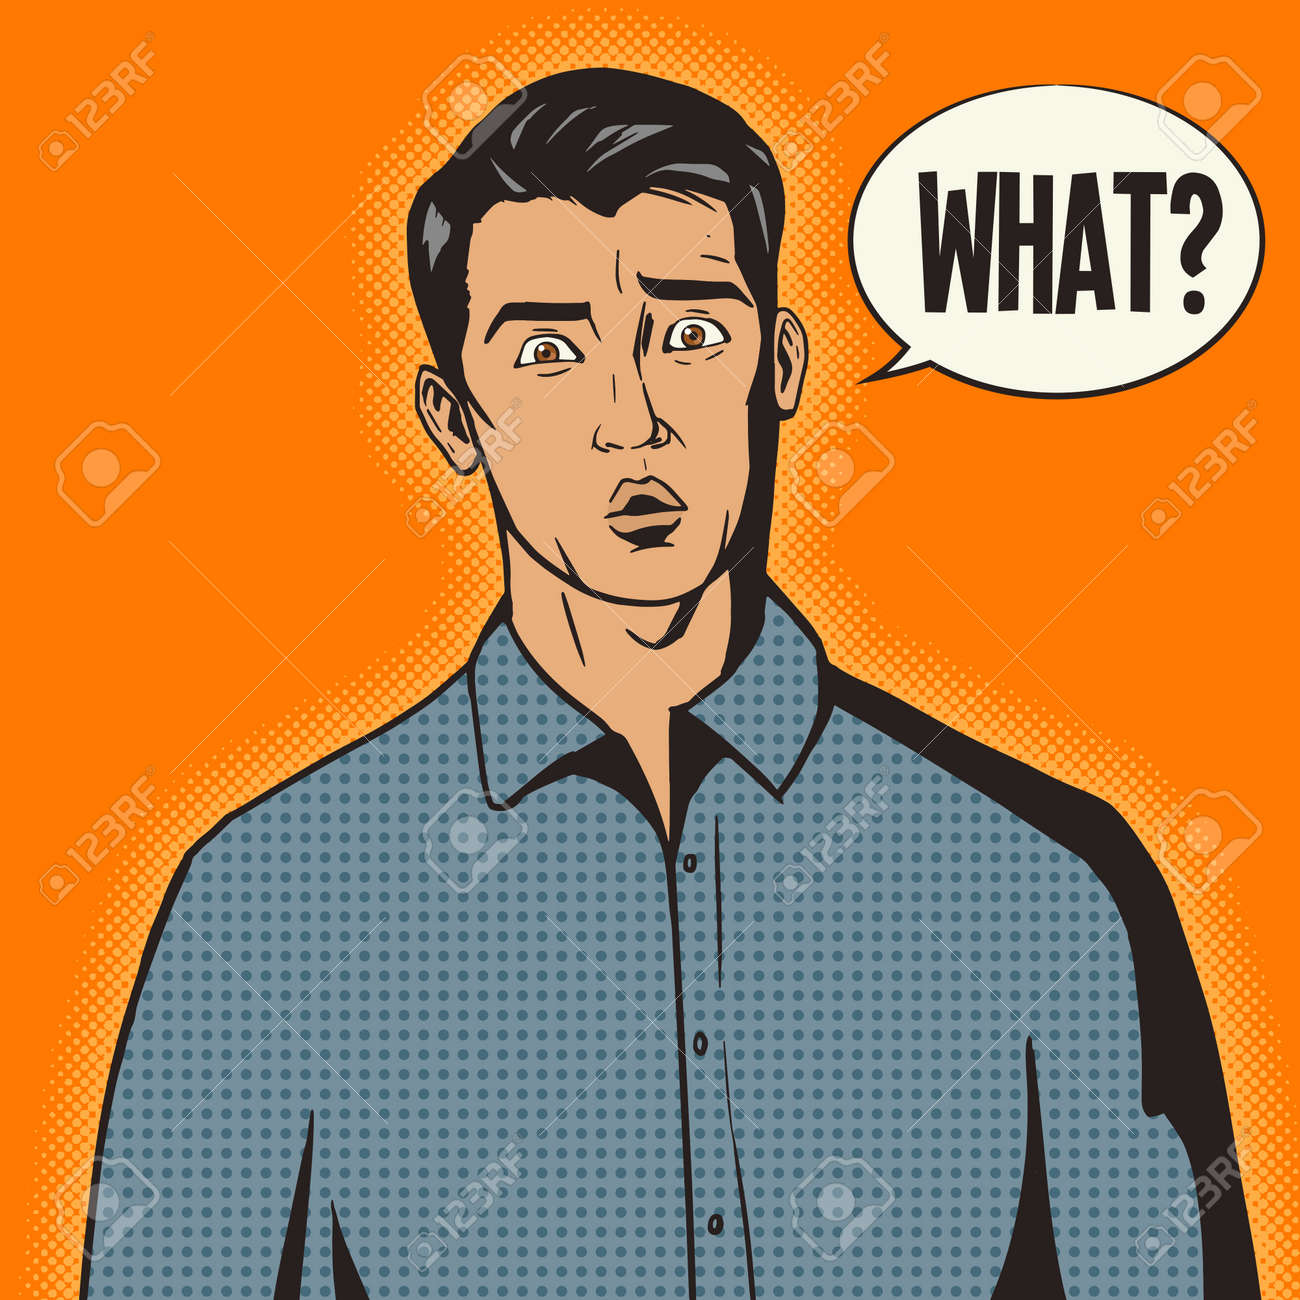 Surprised man pop art retro style vector illustration. Comic book style imitation - 49349120